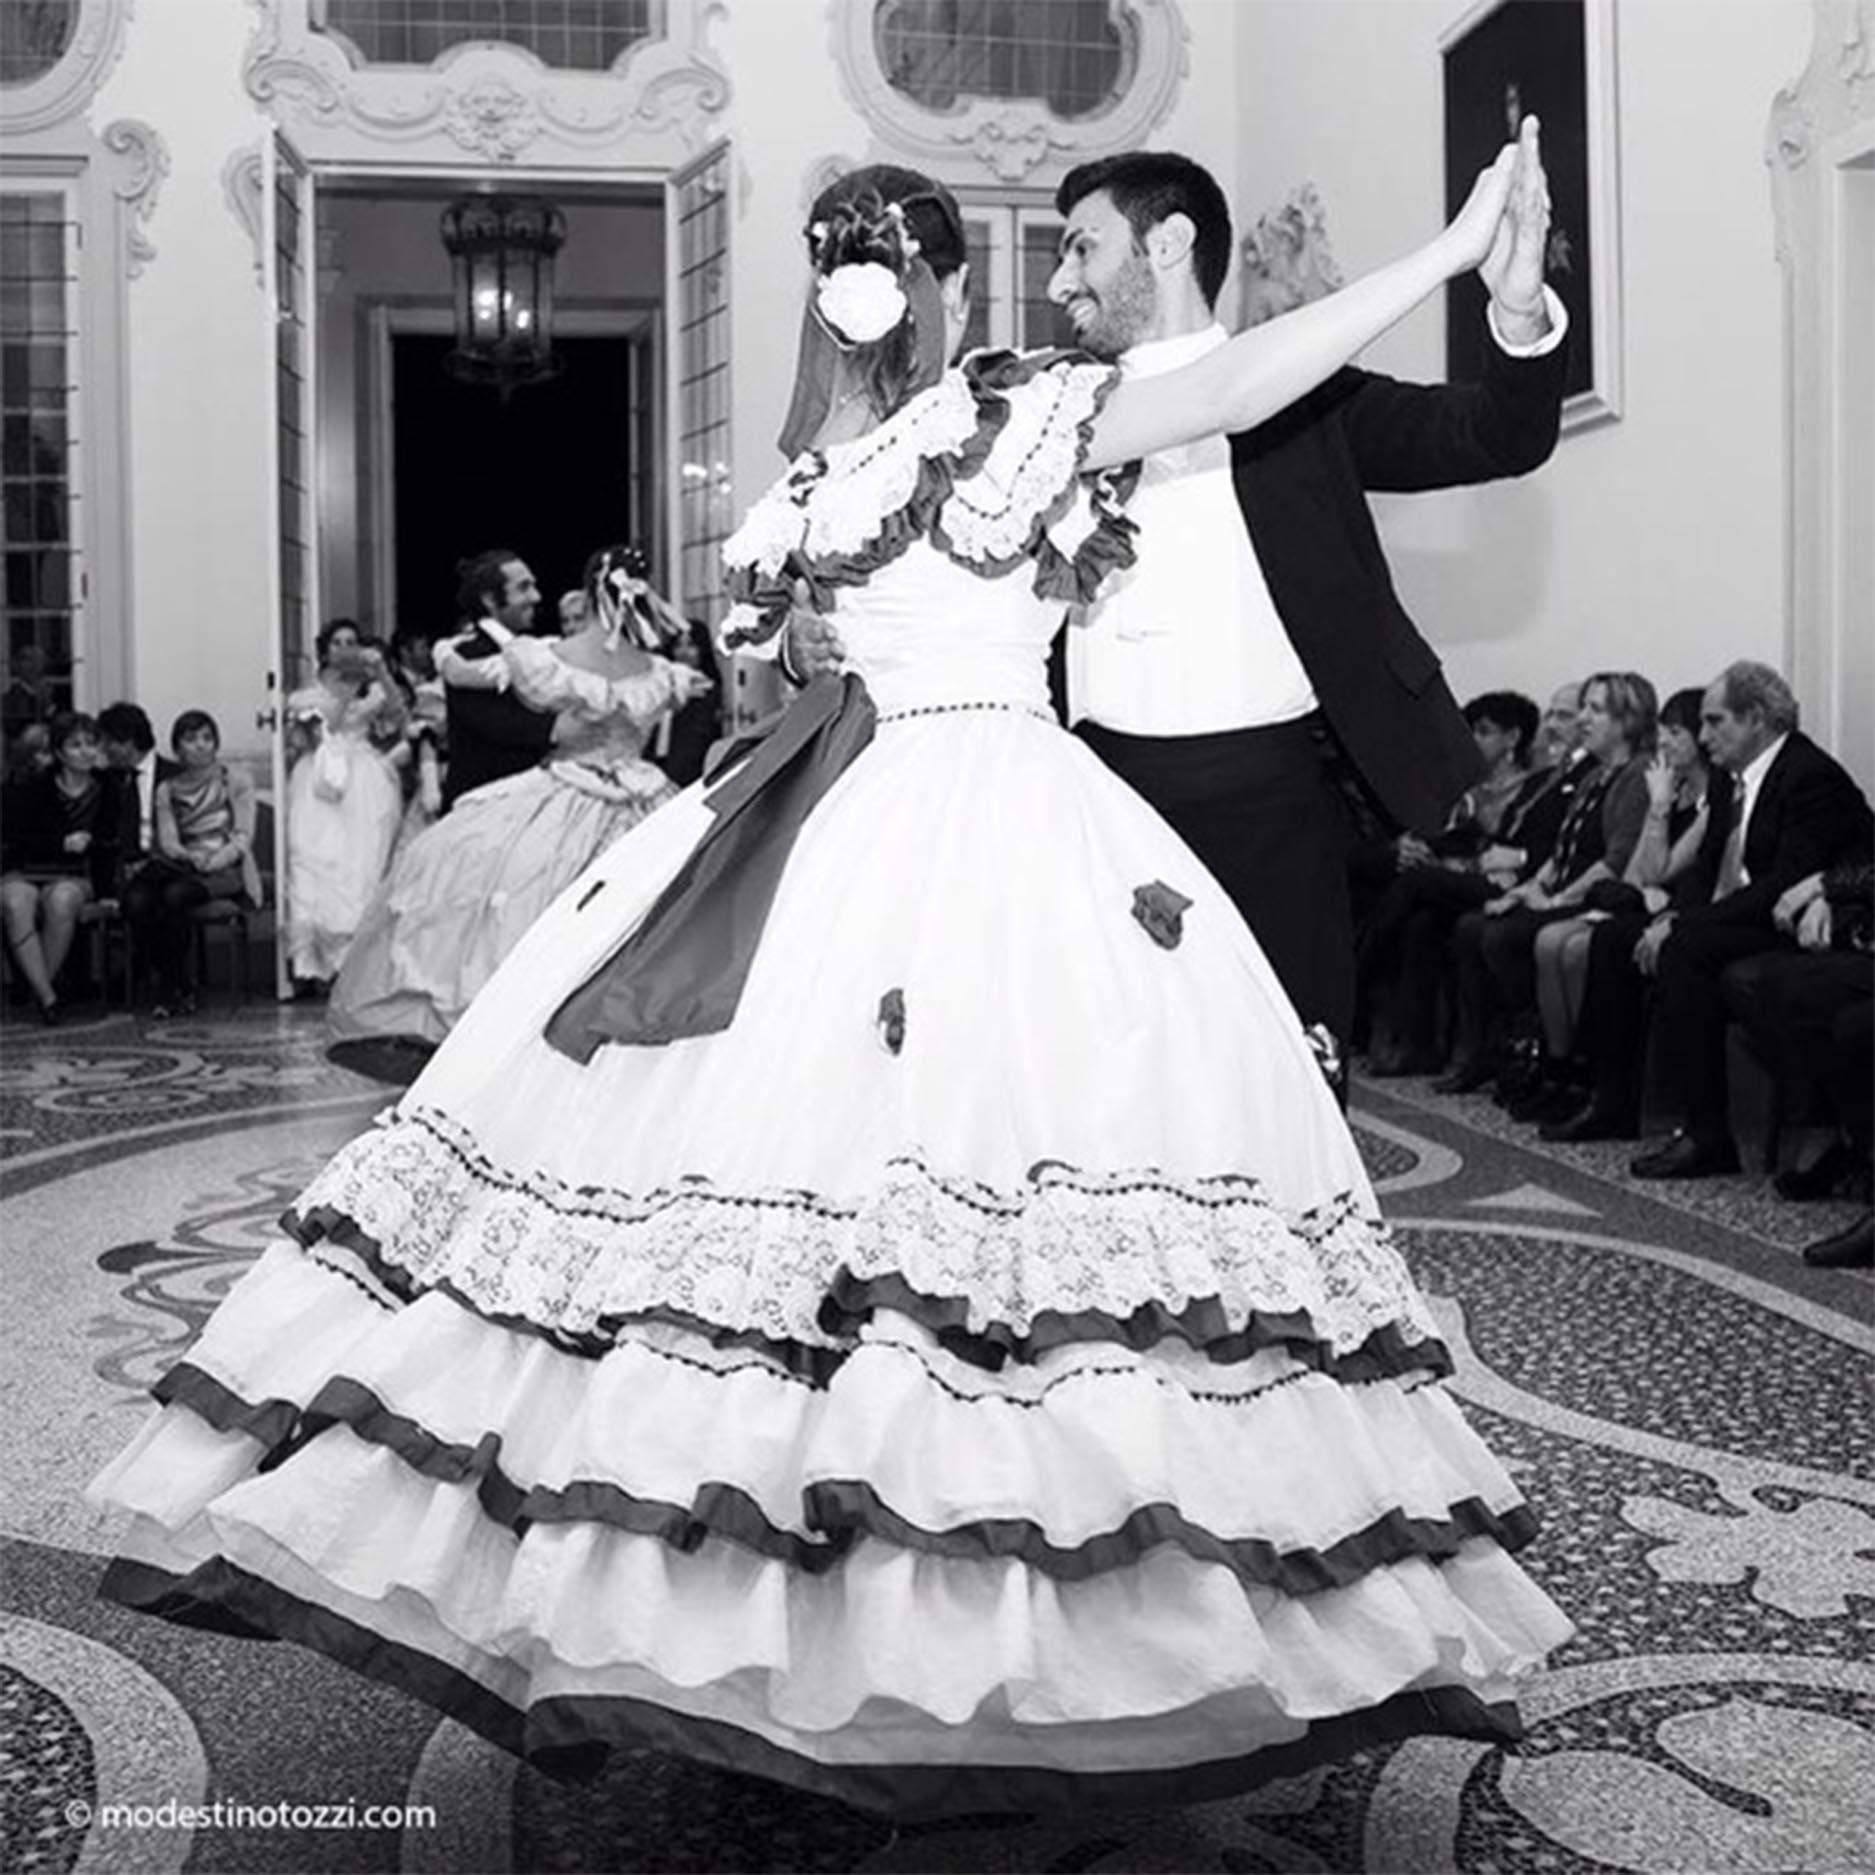 Ballo in Maschera in stile '800 - raccolta fondi